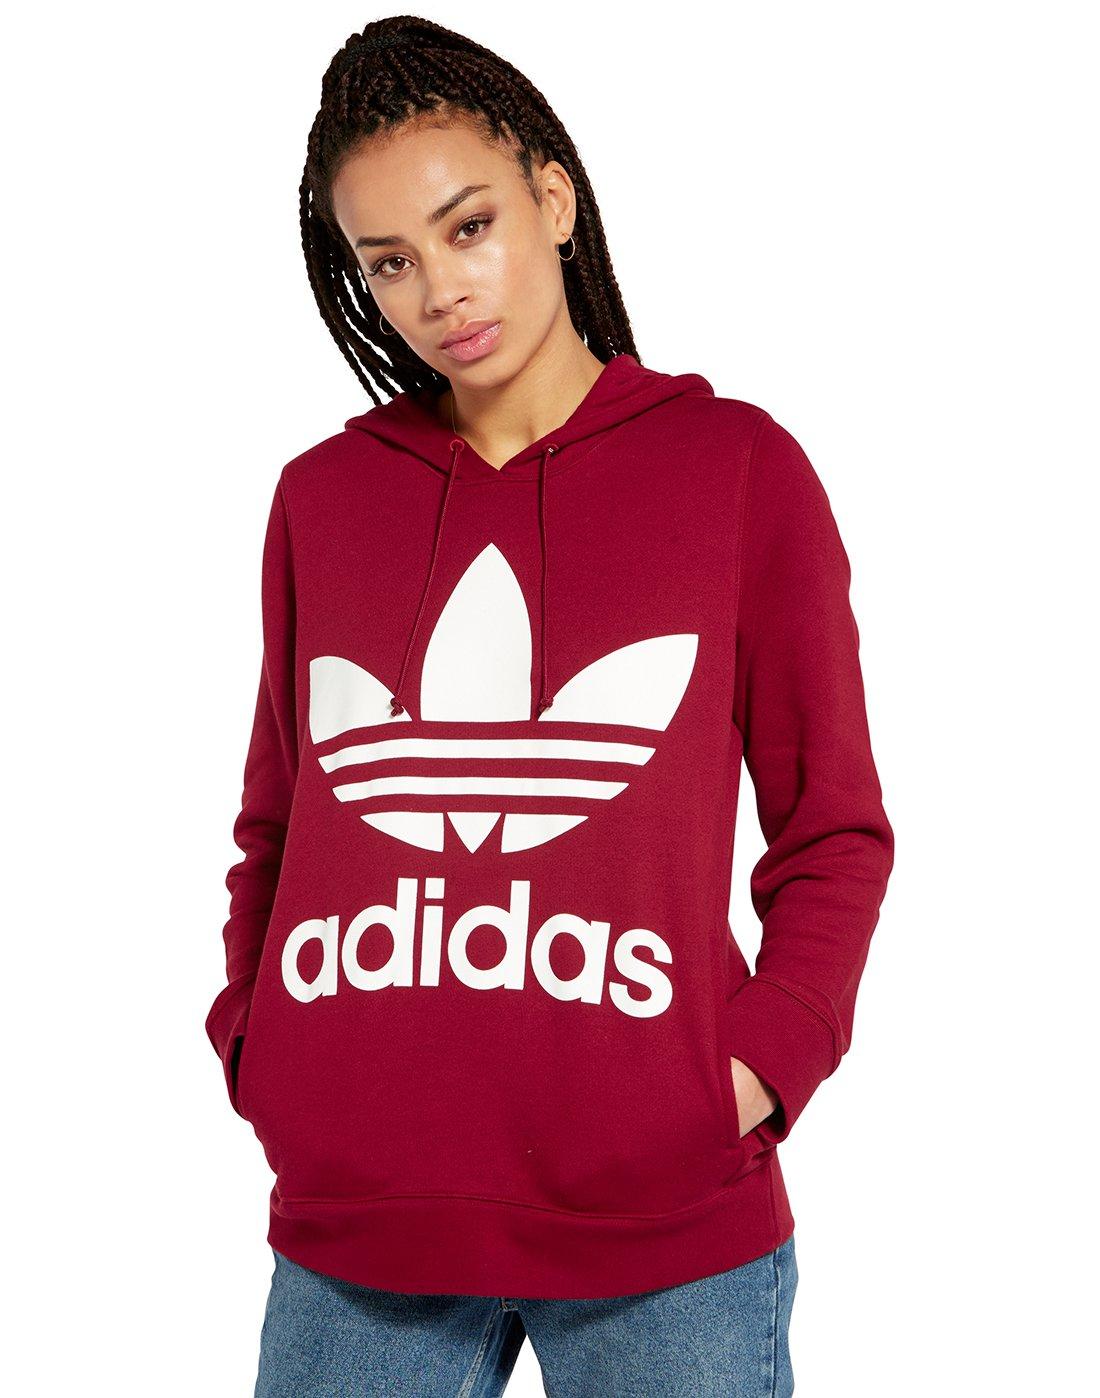 ddf65a567411 adidas Originals. Womens Trefoil Hoodie. Womens Trefoil Hoodie ...